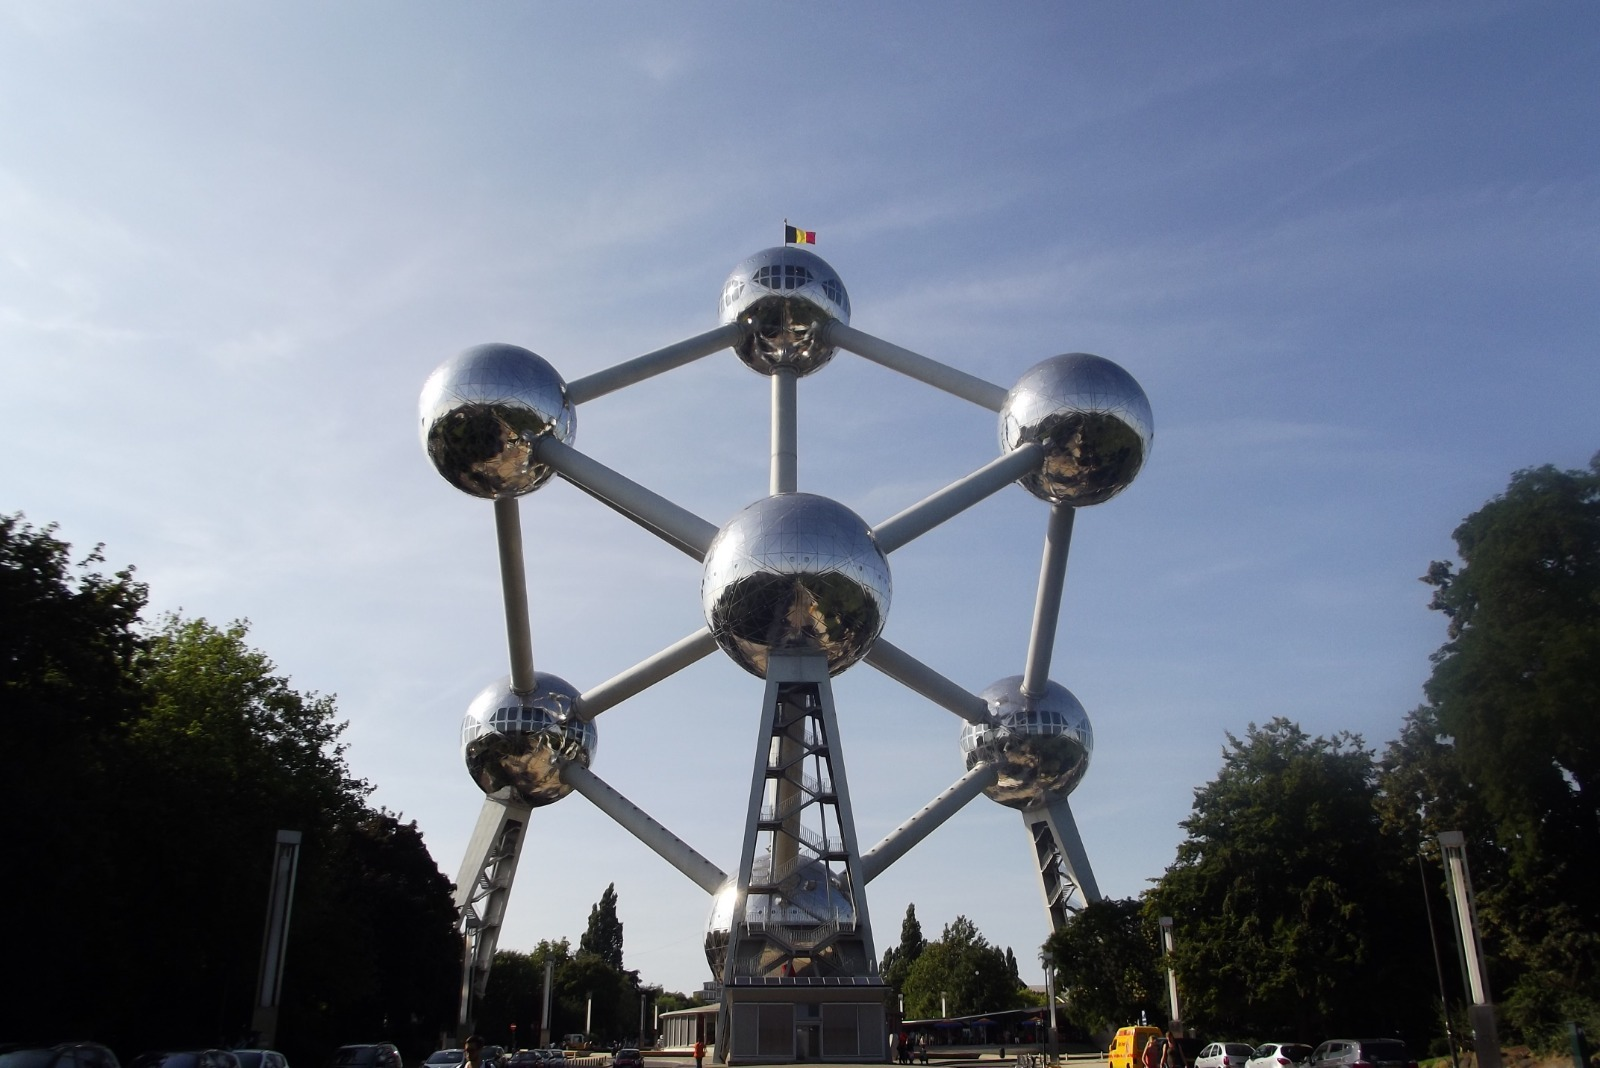 Belgio e Lussemburgo… Meraviglie europee inaspettate!